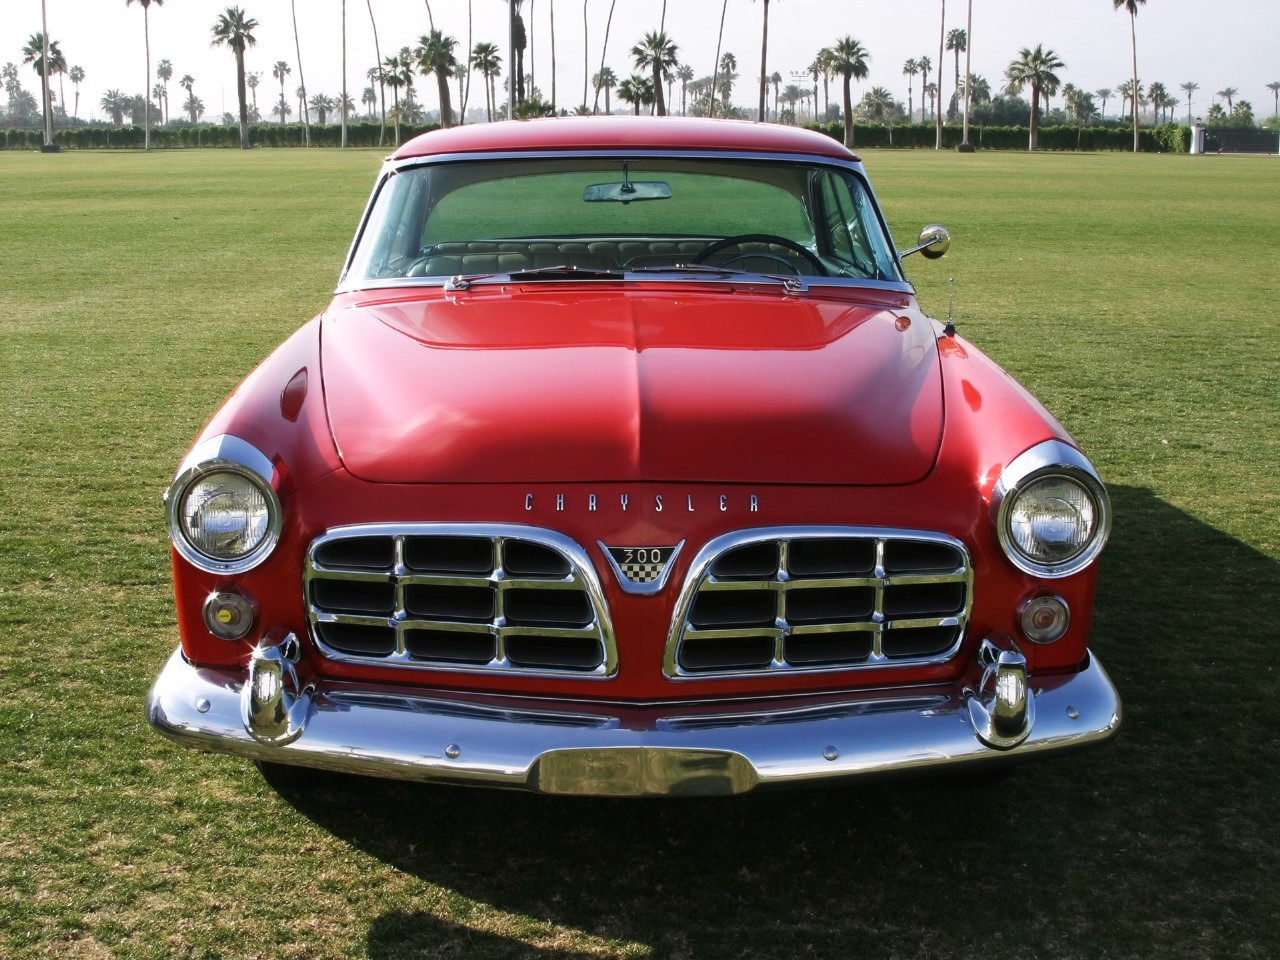 1955 C-300 5